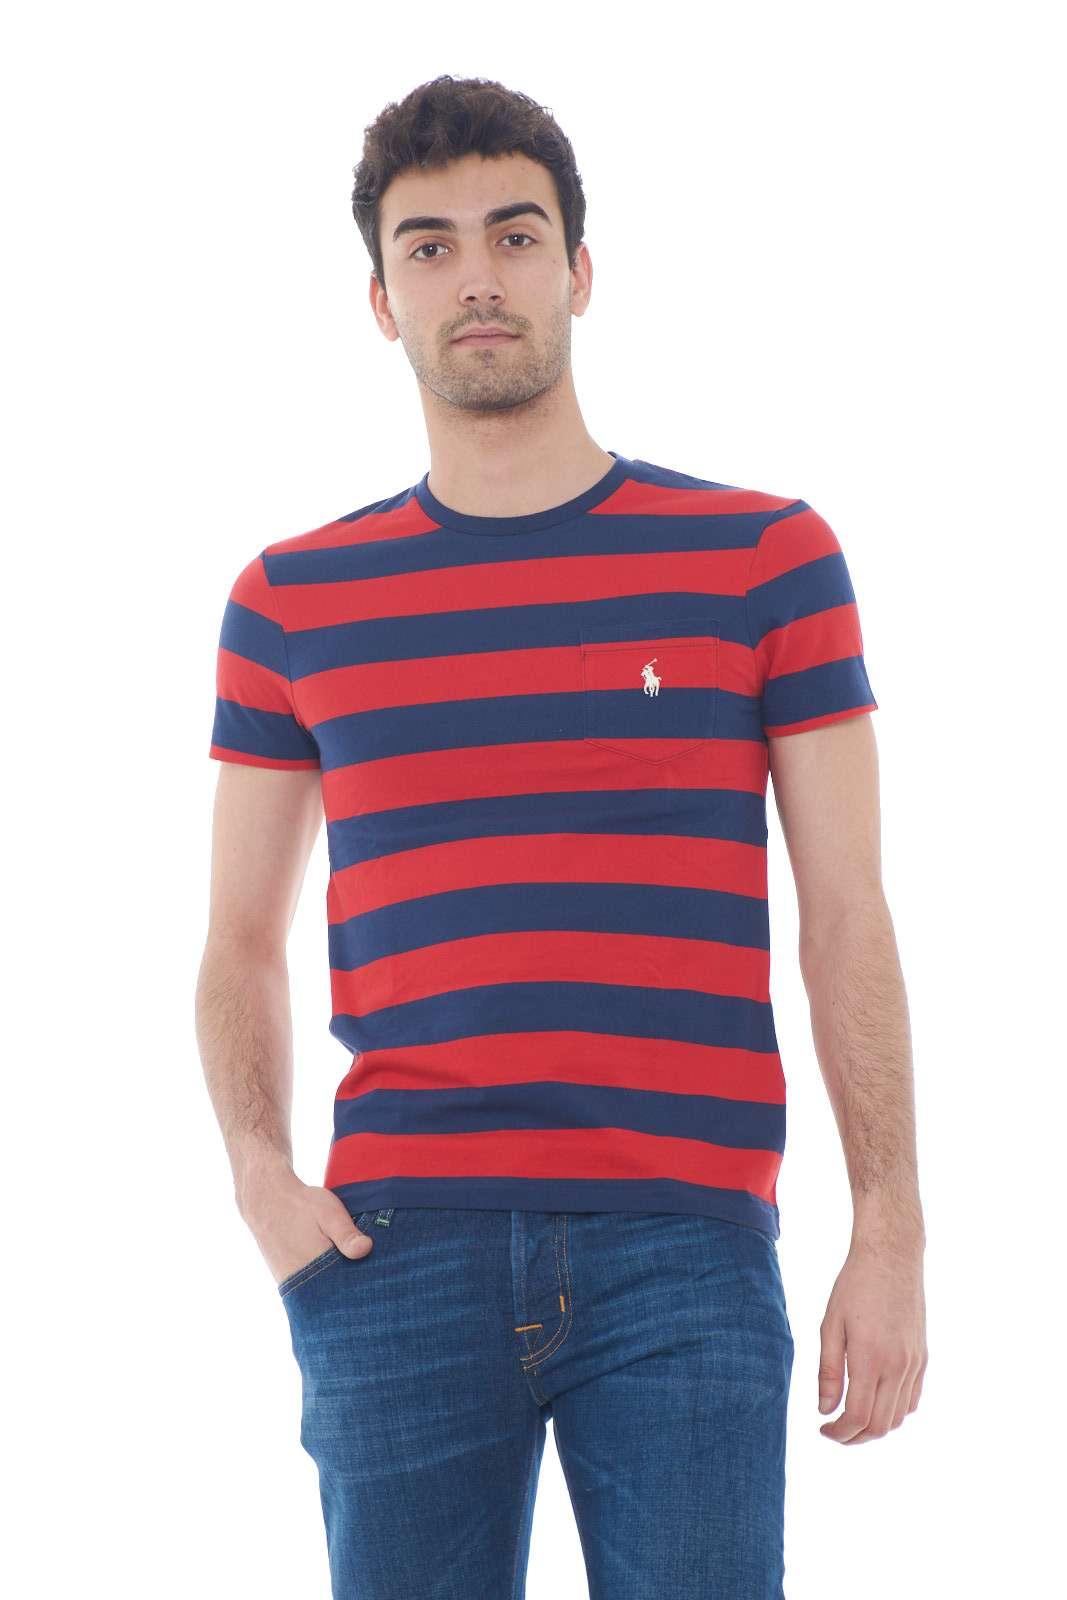 https://www.parmax.com/media/catalog/product/a/i/PE-outlet_parmax-t-shirt-uomo-Raph-Lauren-710740882-A.jpg